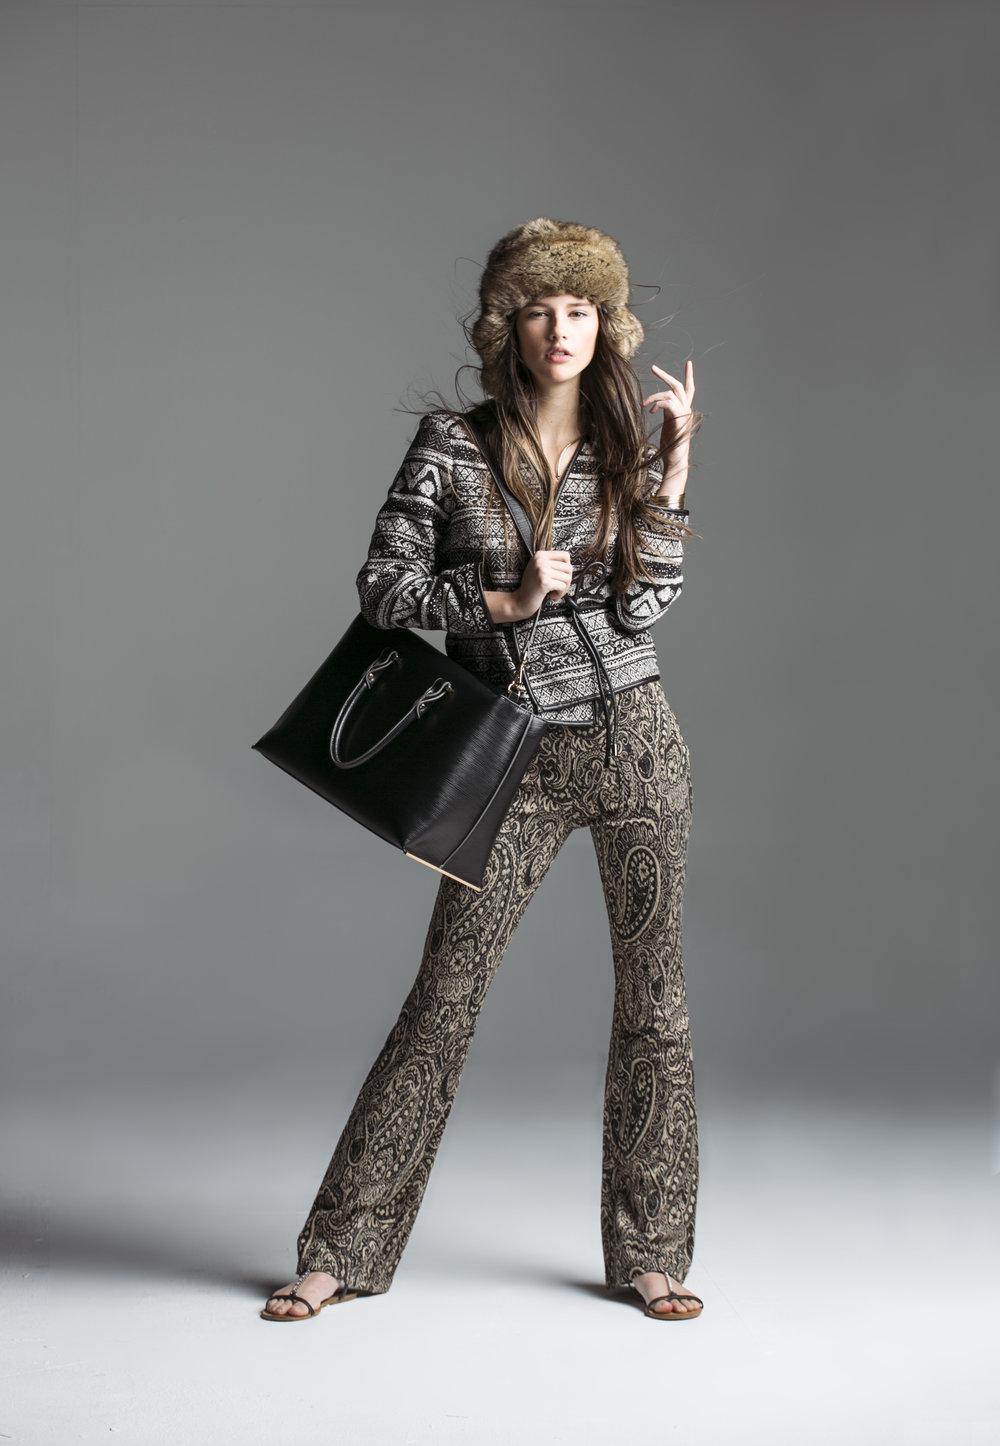 rachel fur IG 2.jpg